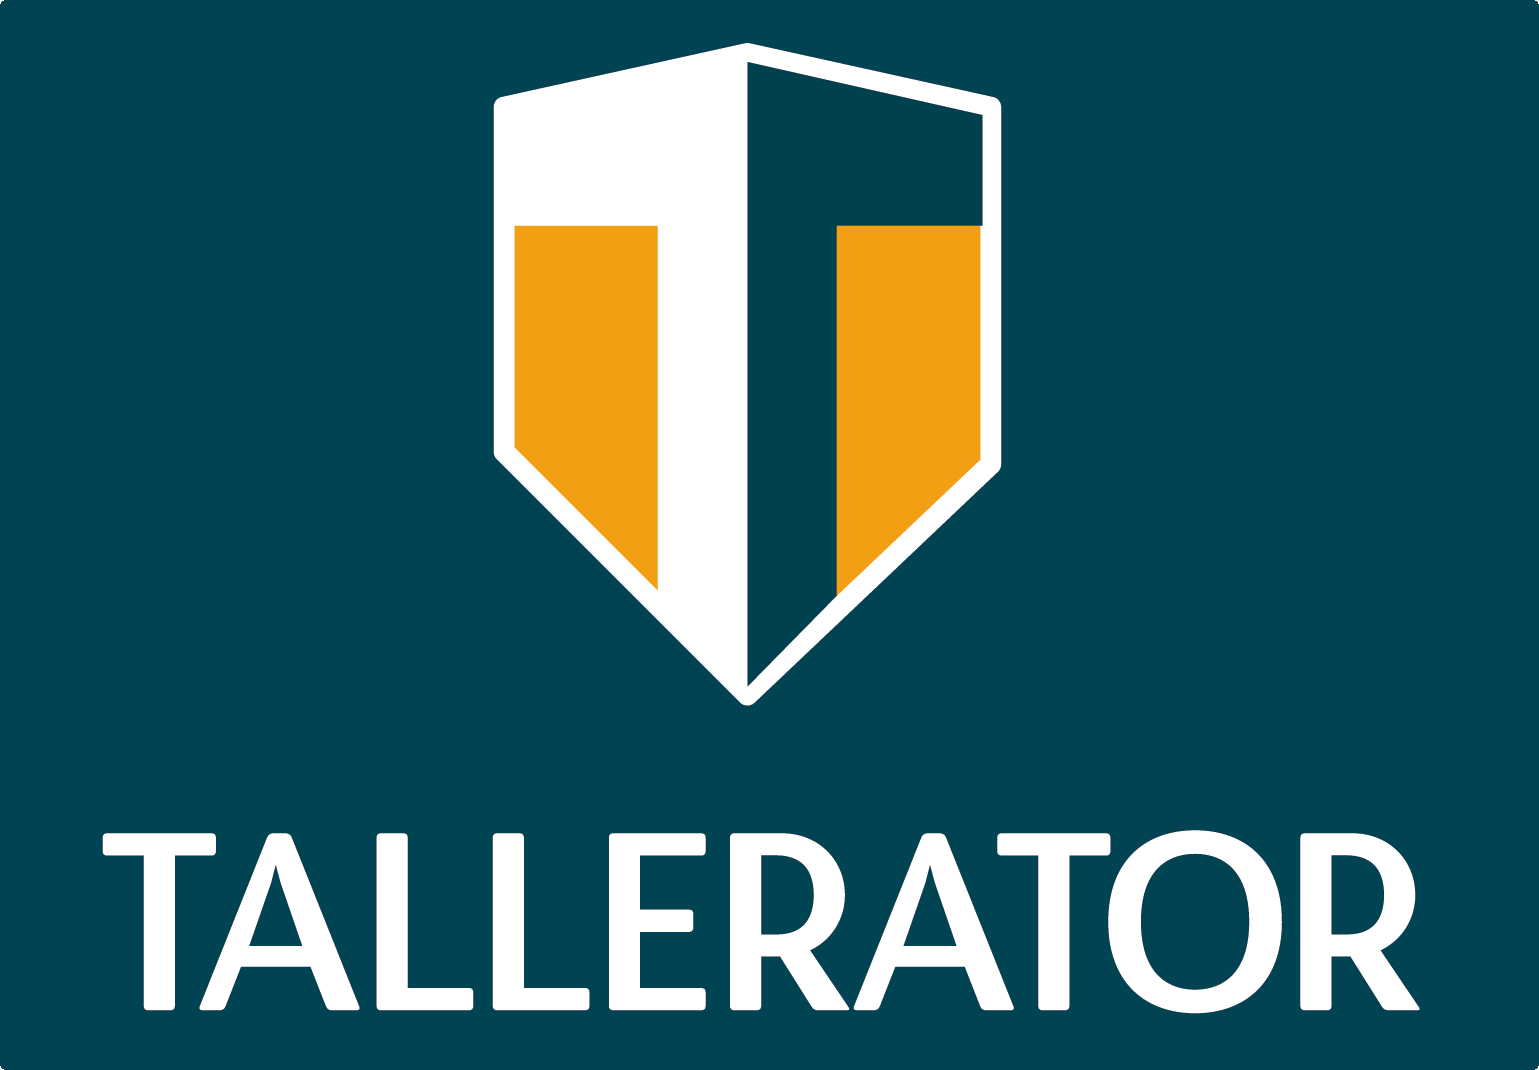 tallerator-logo